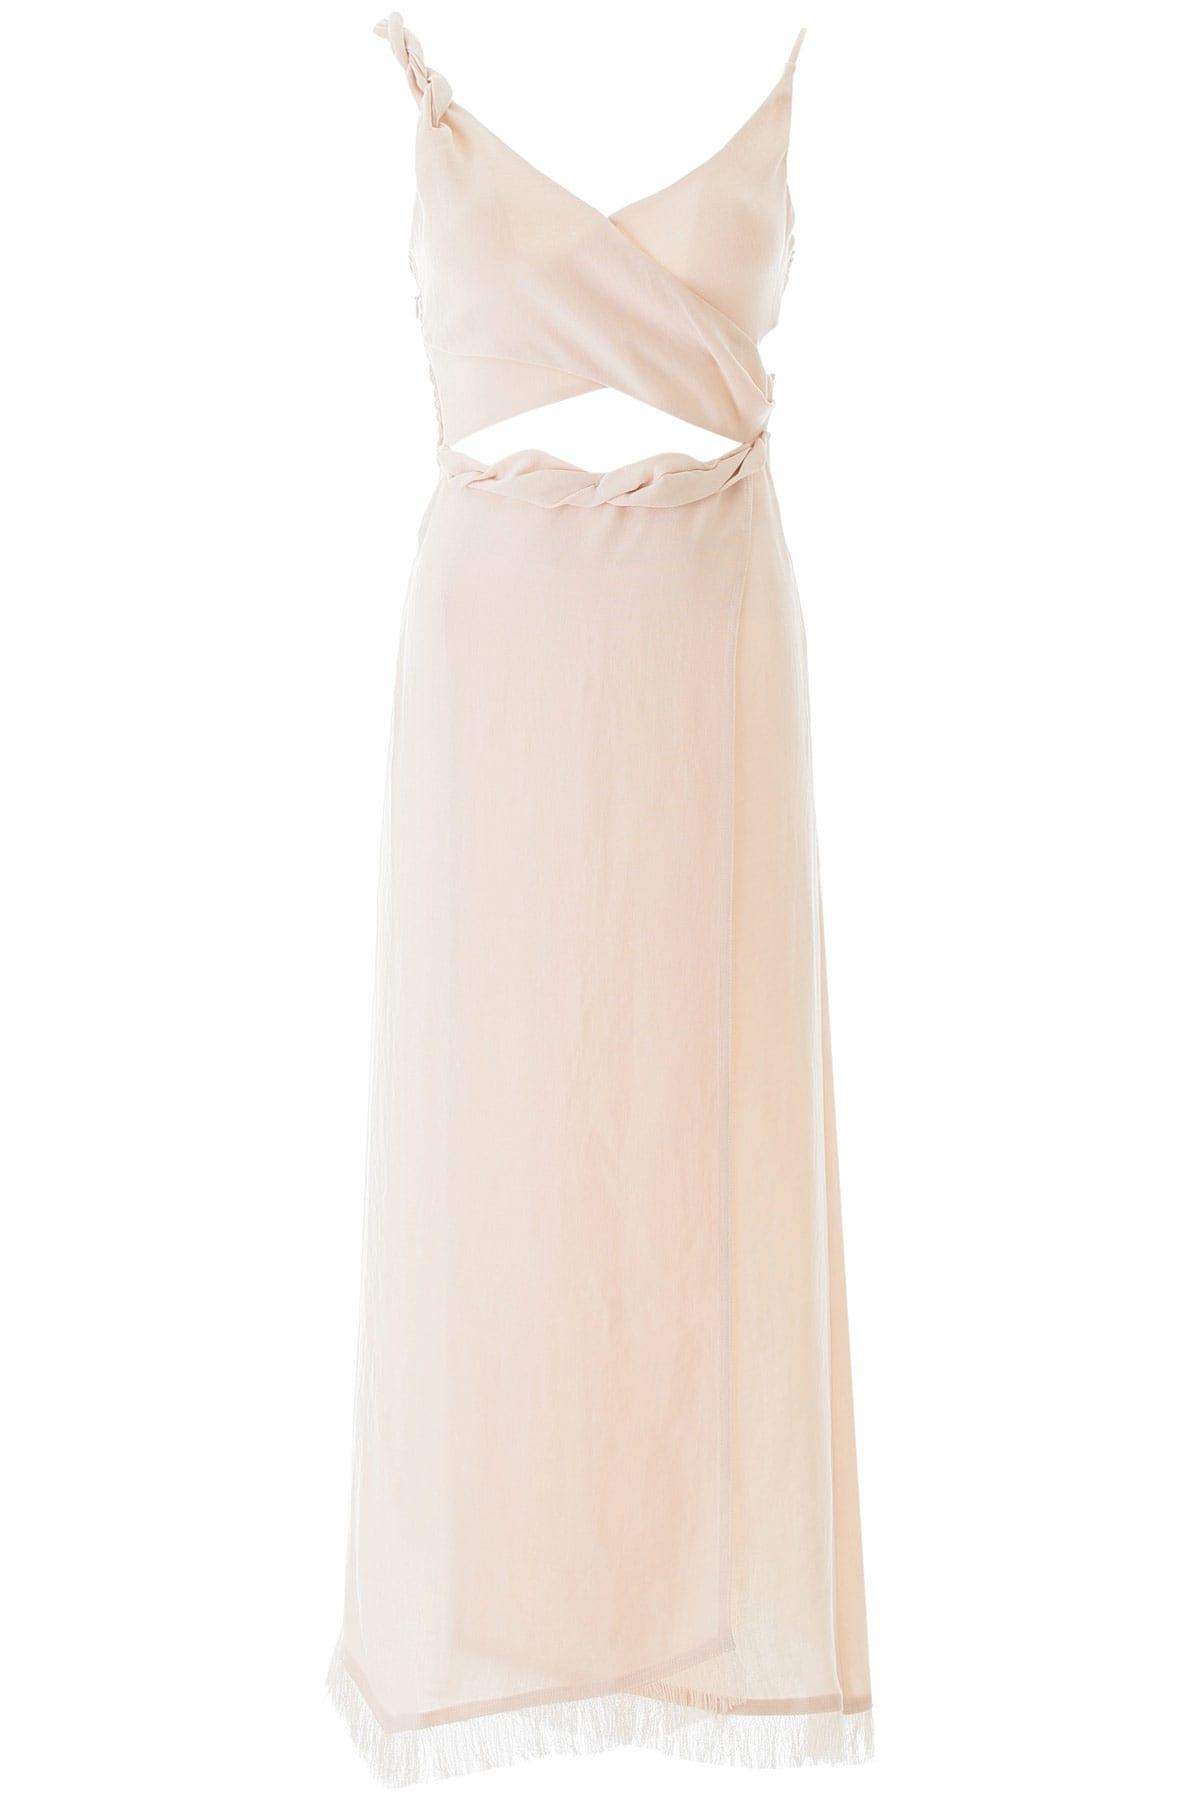 Nanushka Sloan Long Dress